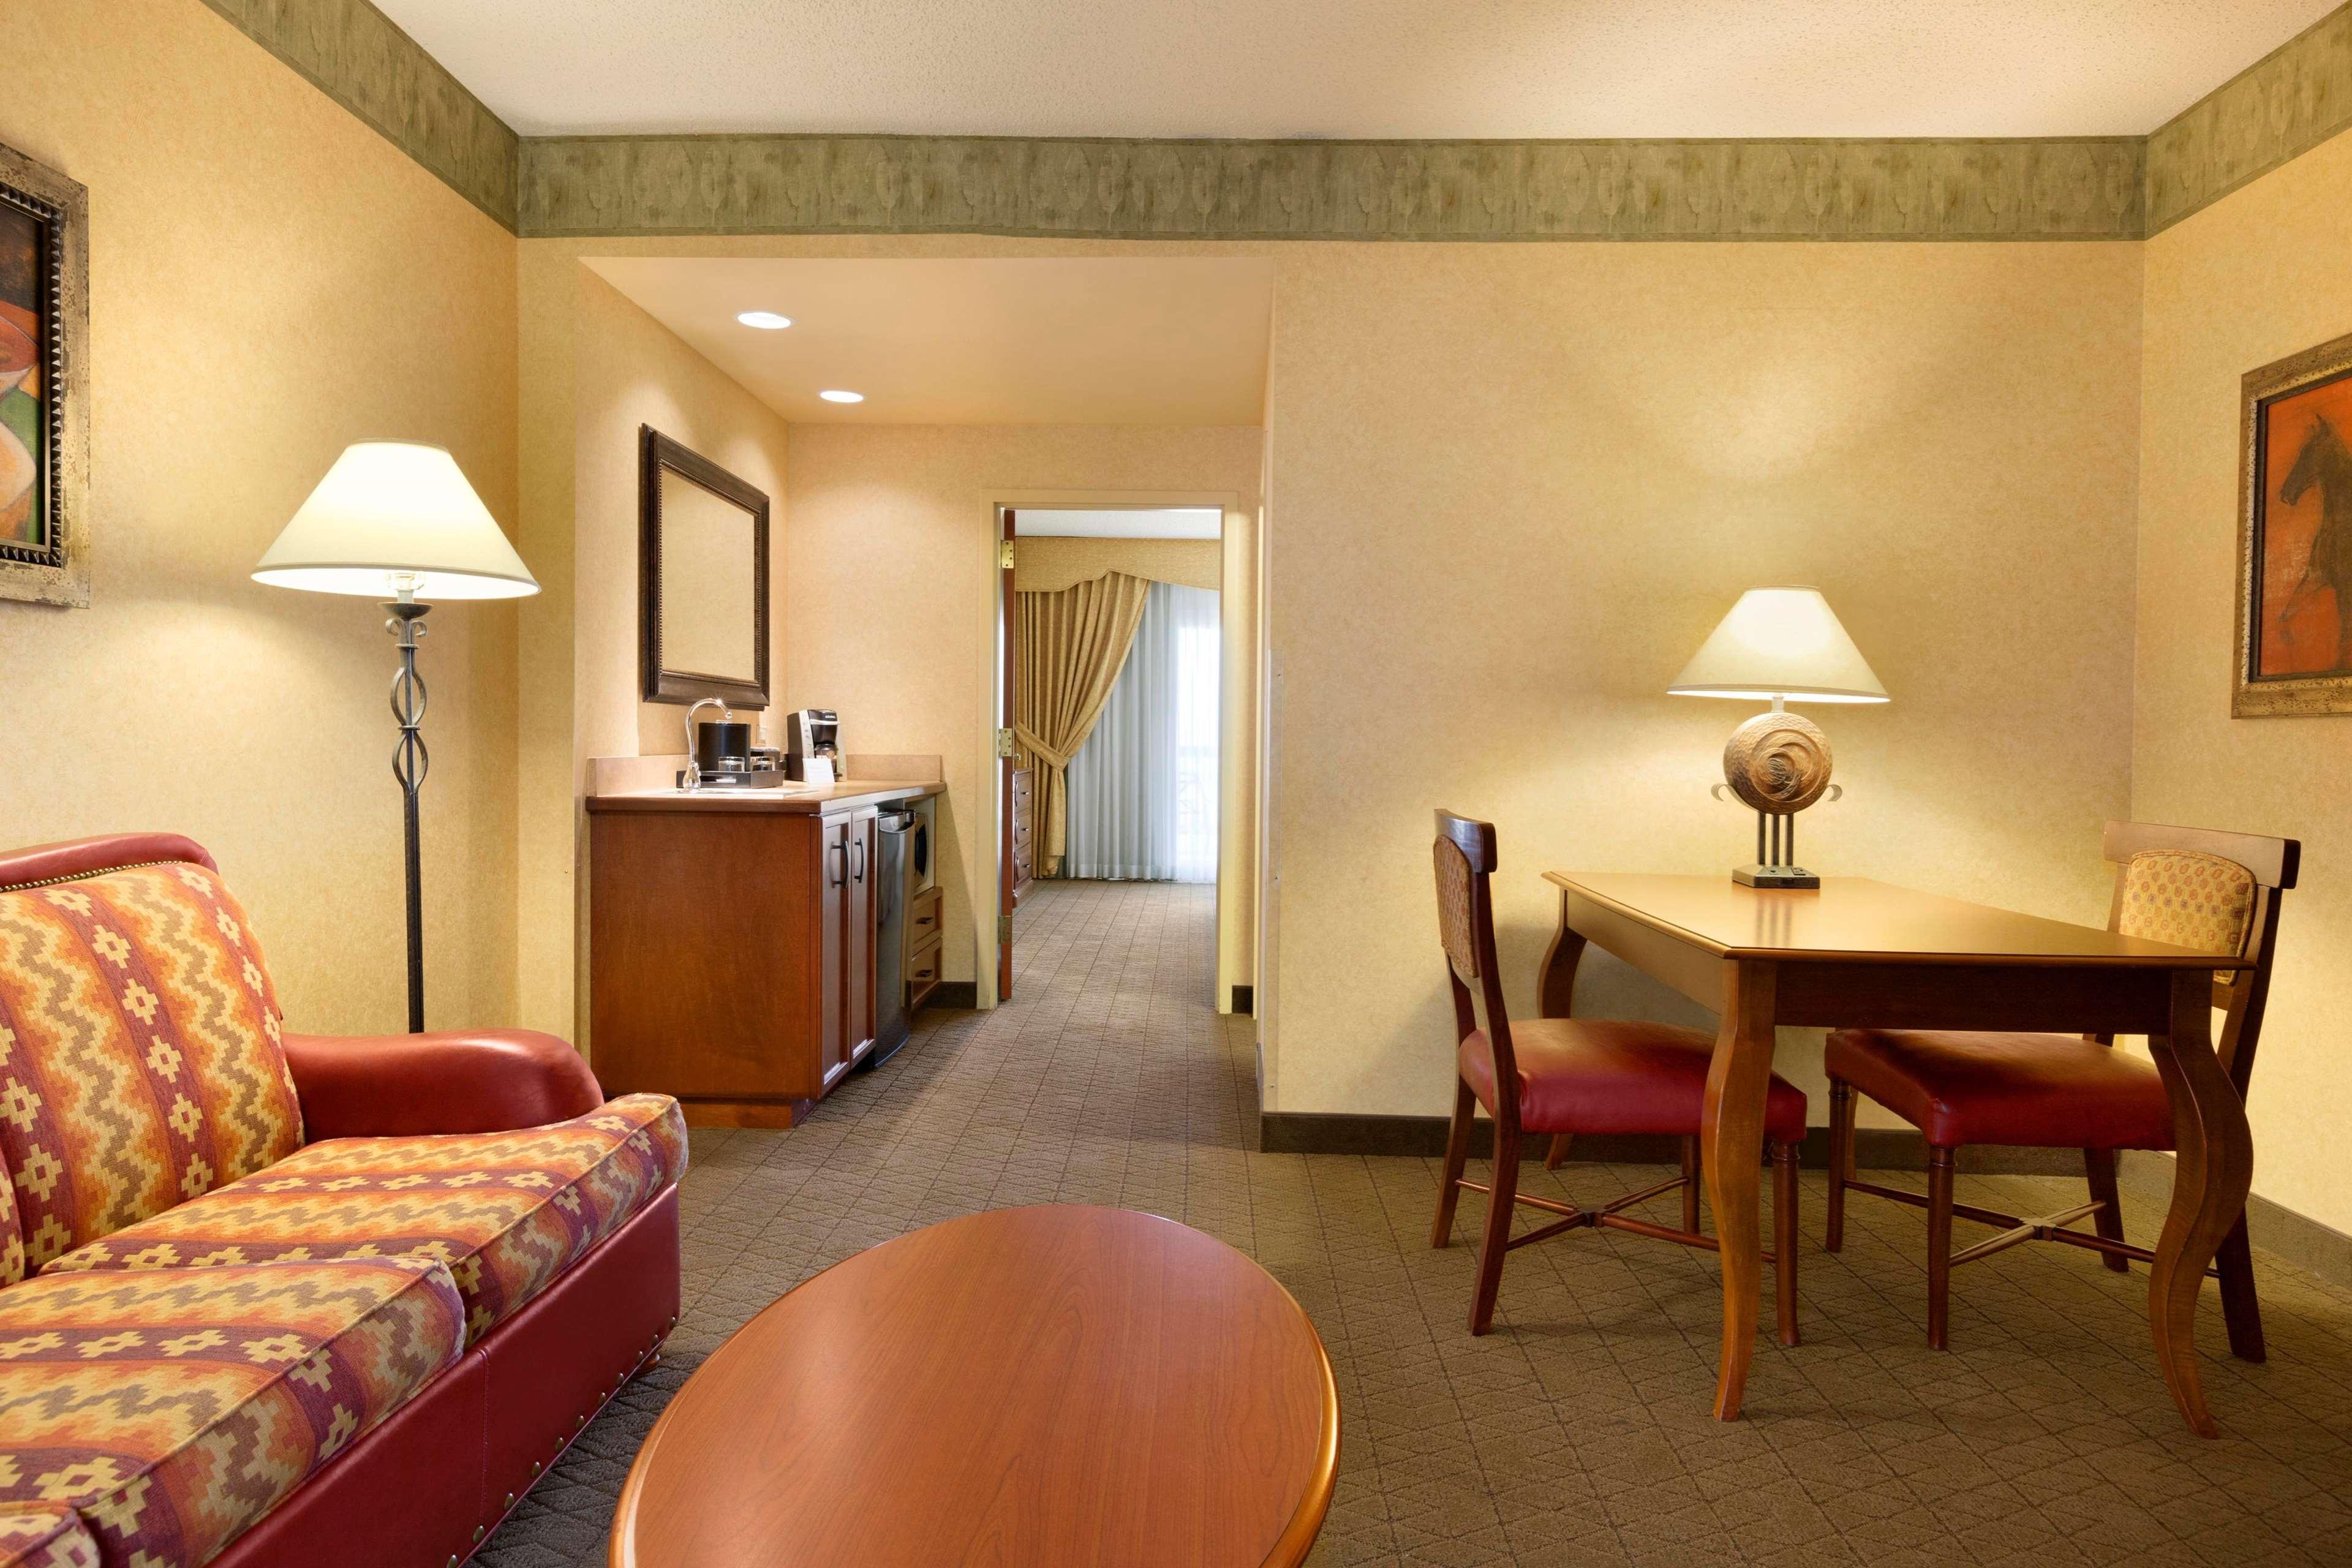 Embassy Suites by Hilton Albuquerque Hotel & Spa image 18